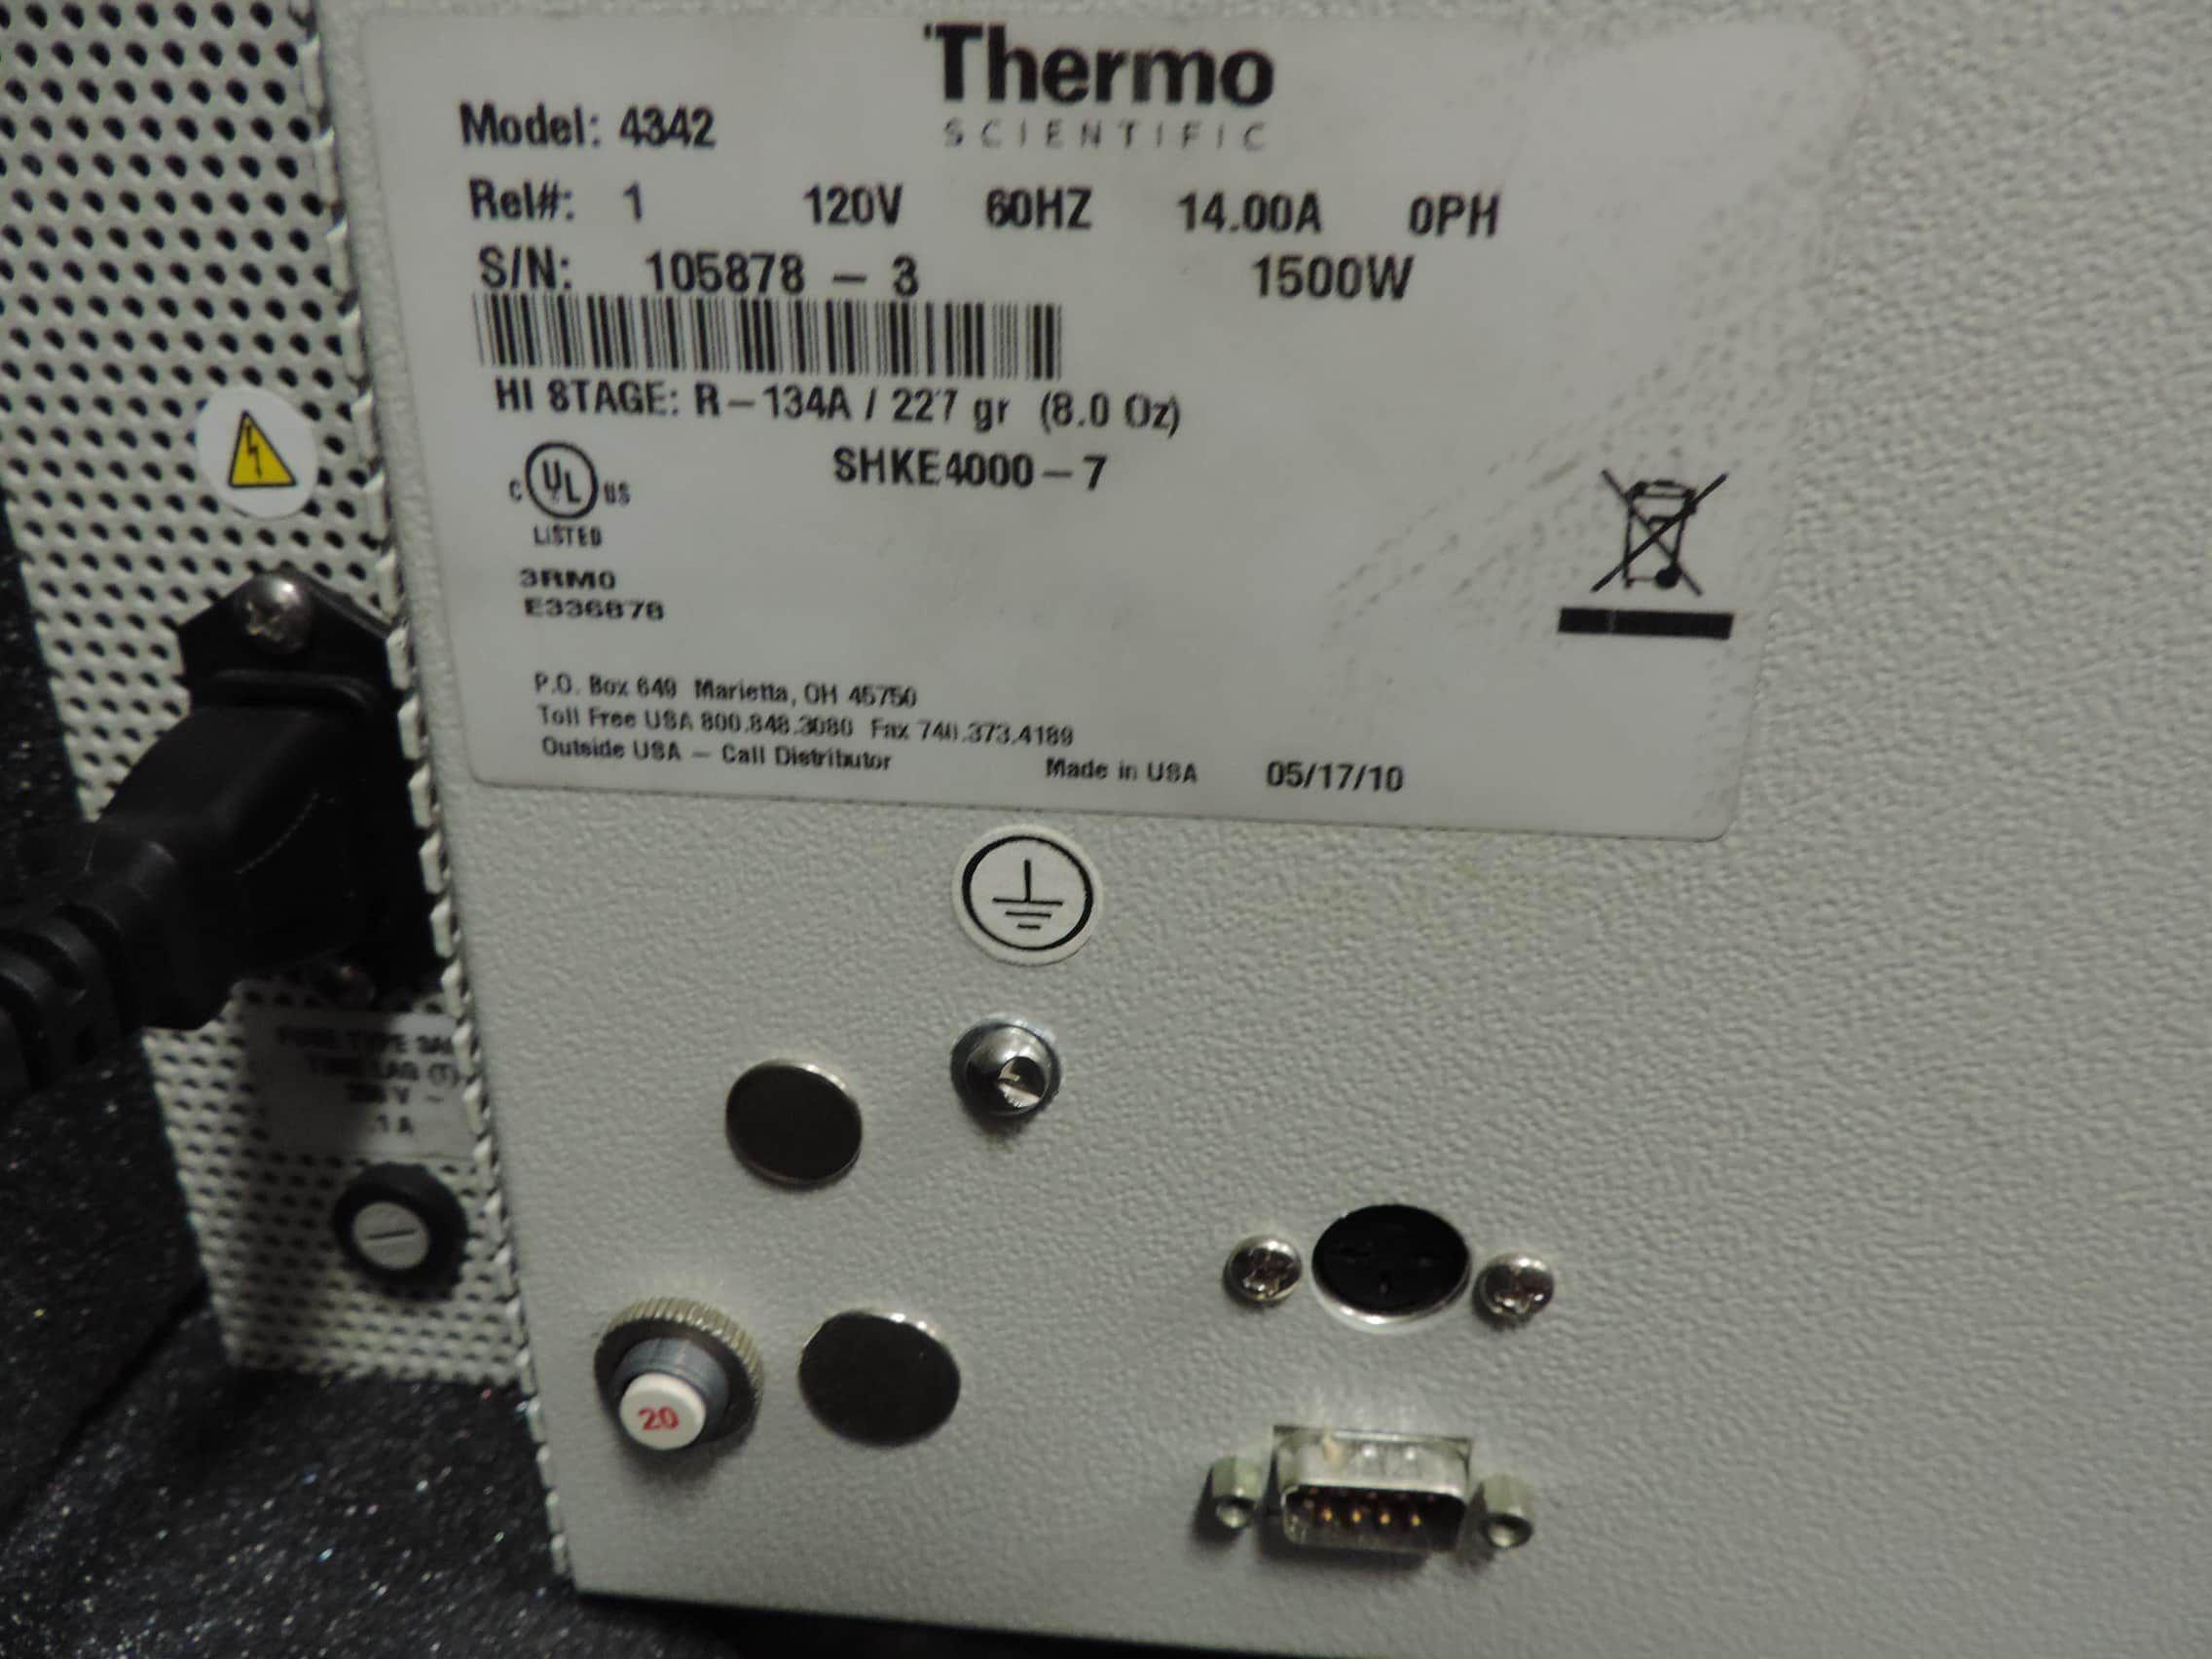 Thermo™ MaxQ 4000® Incubator/Chiller/Shaker (Model SHKE-7000-4542)